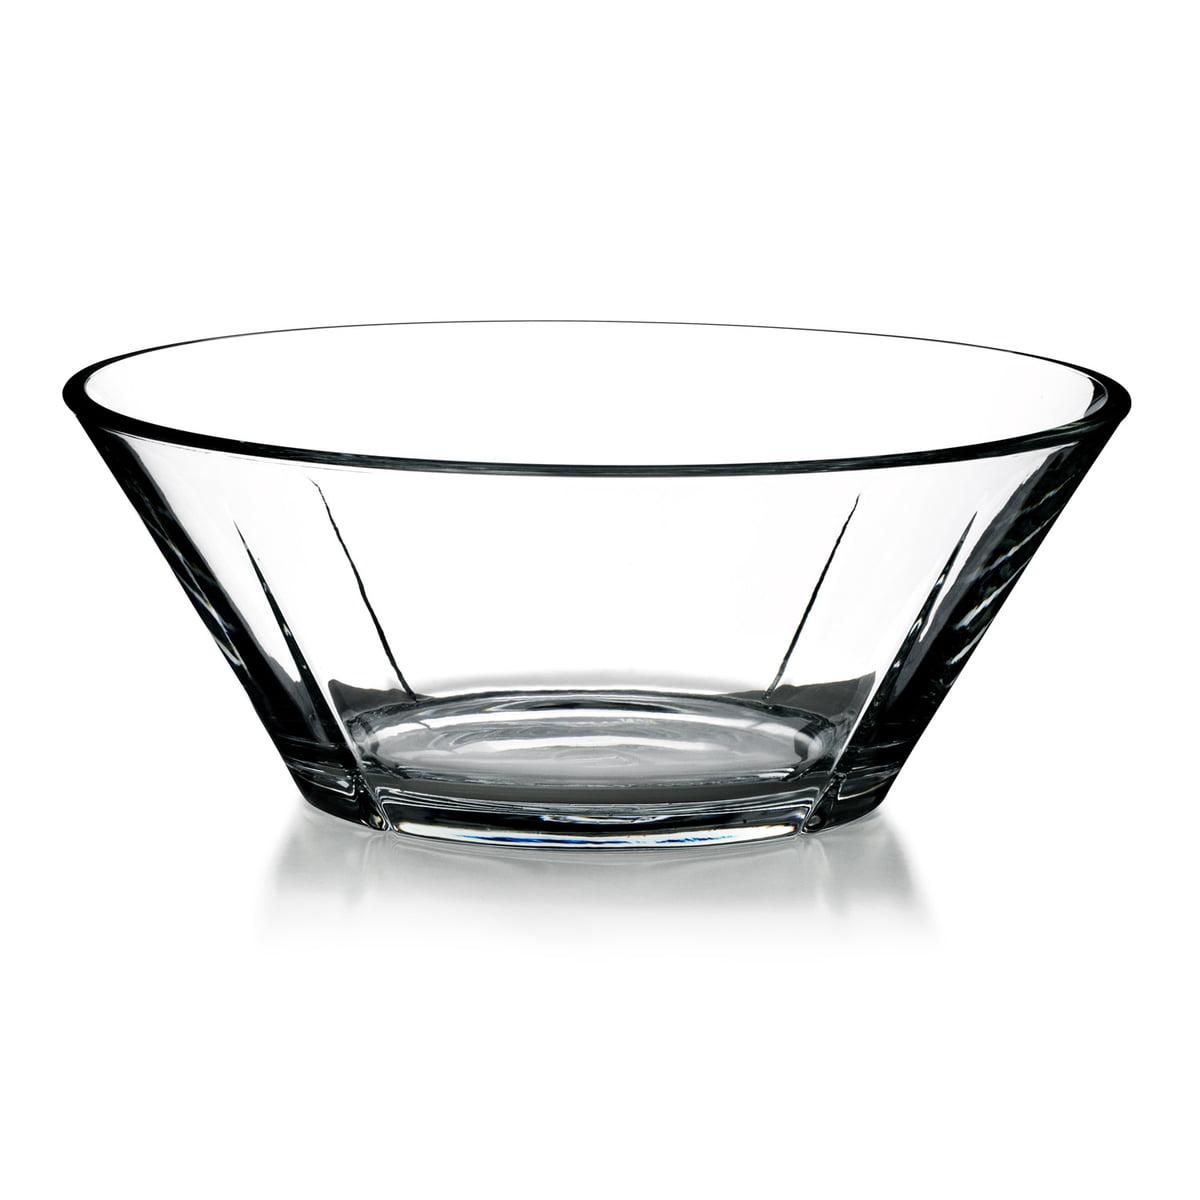 Grand Cru Glass Bowl By Rosendahl In The Shop